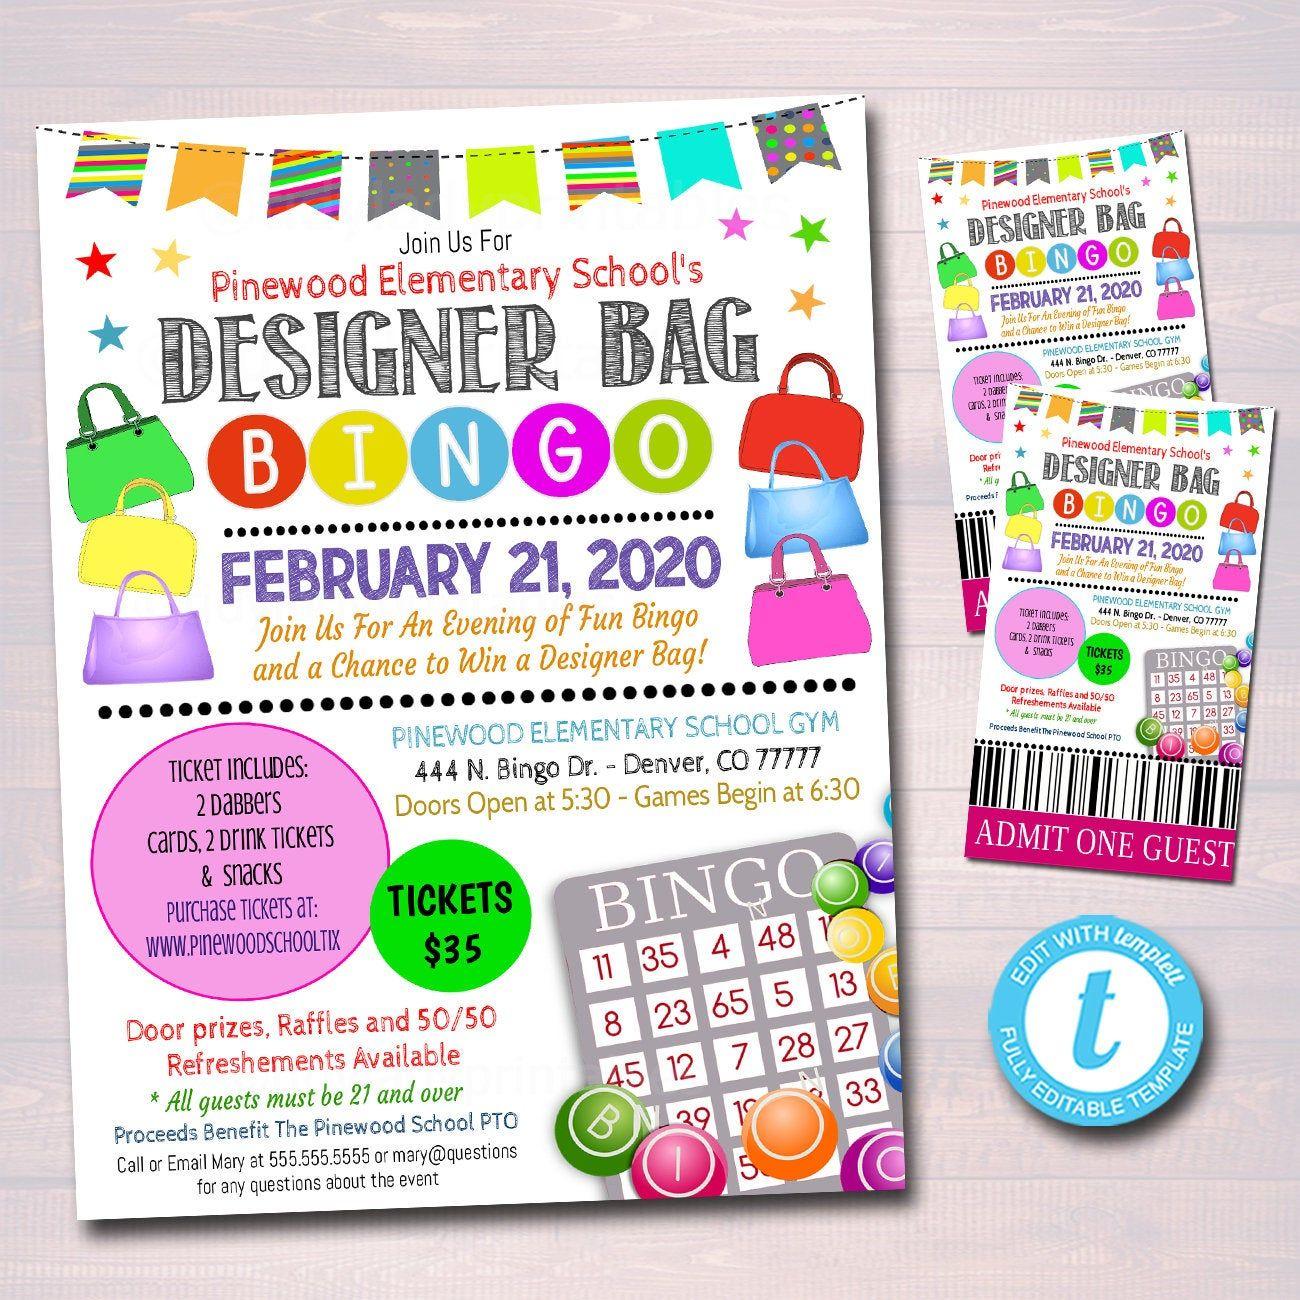 Designer Bag Bingo Night Flyer Ticket Set School Pto Pta In Turning Stone Bingo Calendar For February 2020